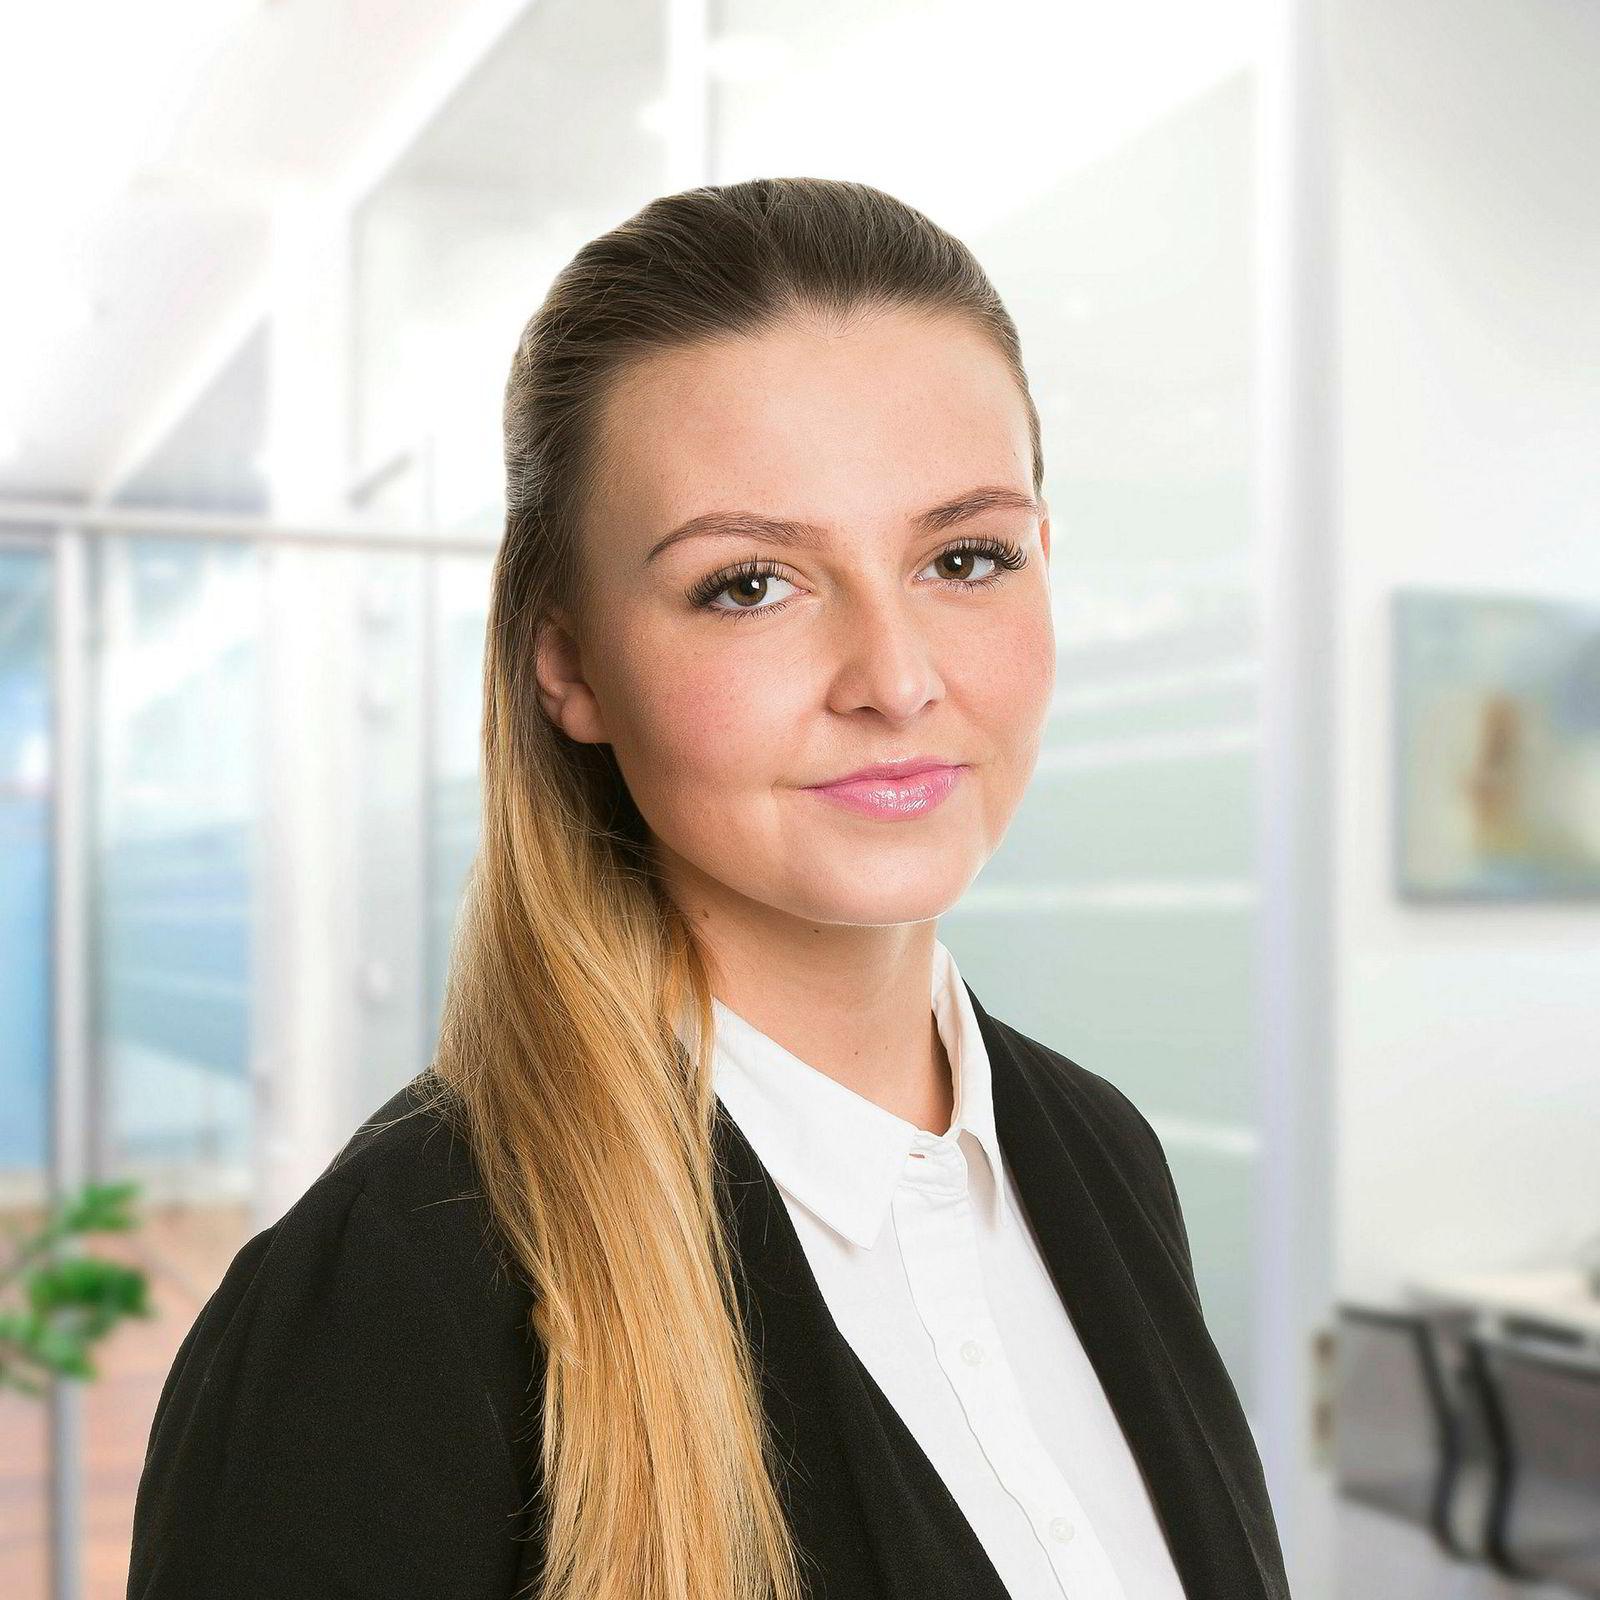 Eiendomsmeglerfullmektig Madeleine Aursøy Larsson i Eiendomsmegler 1